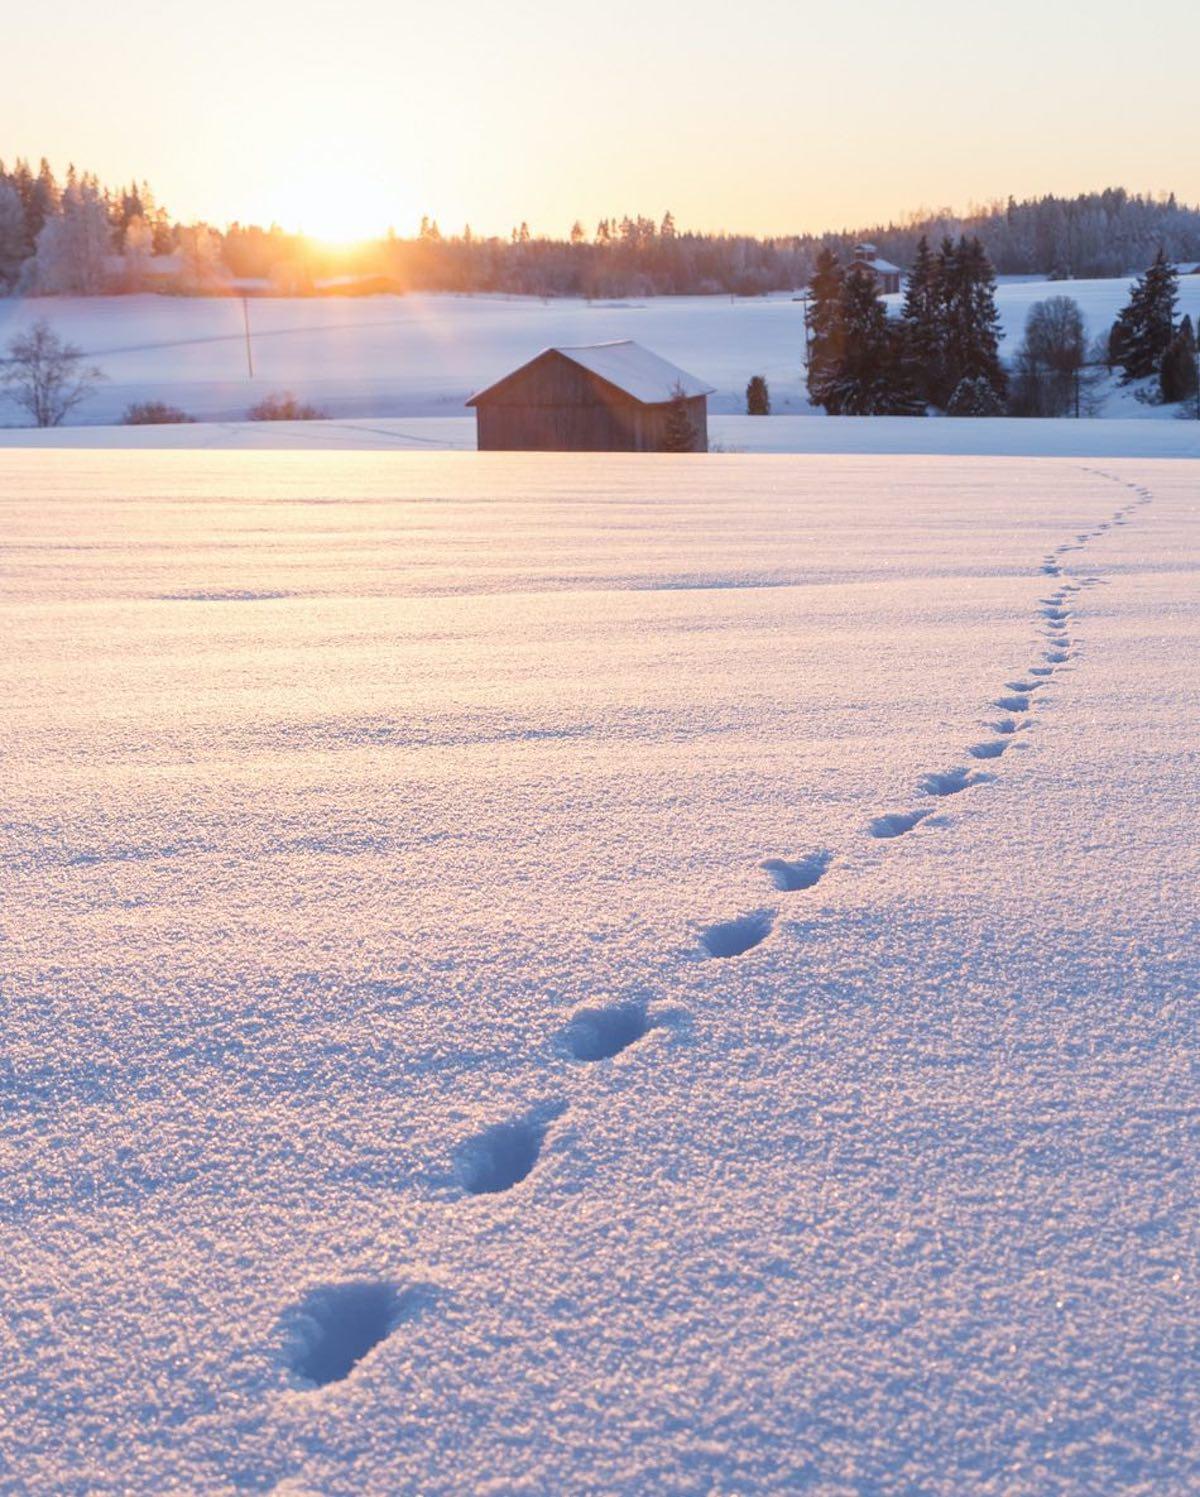 NORDIC-way-of-life-snowy-path-nordic-wisdom1